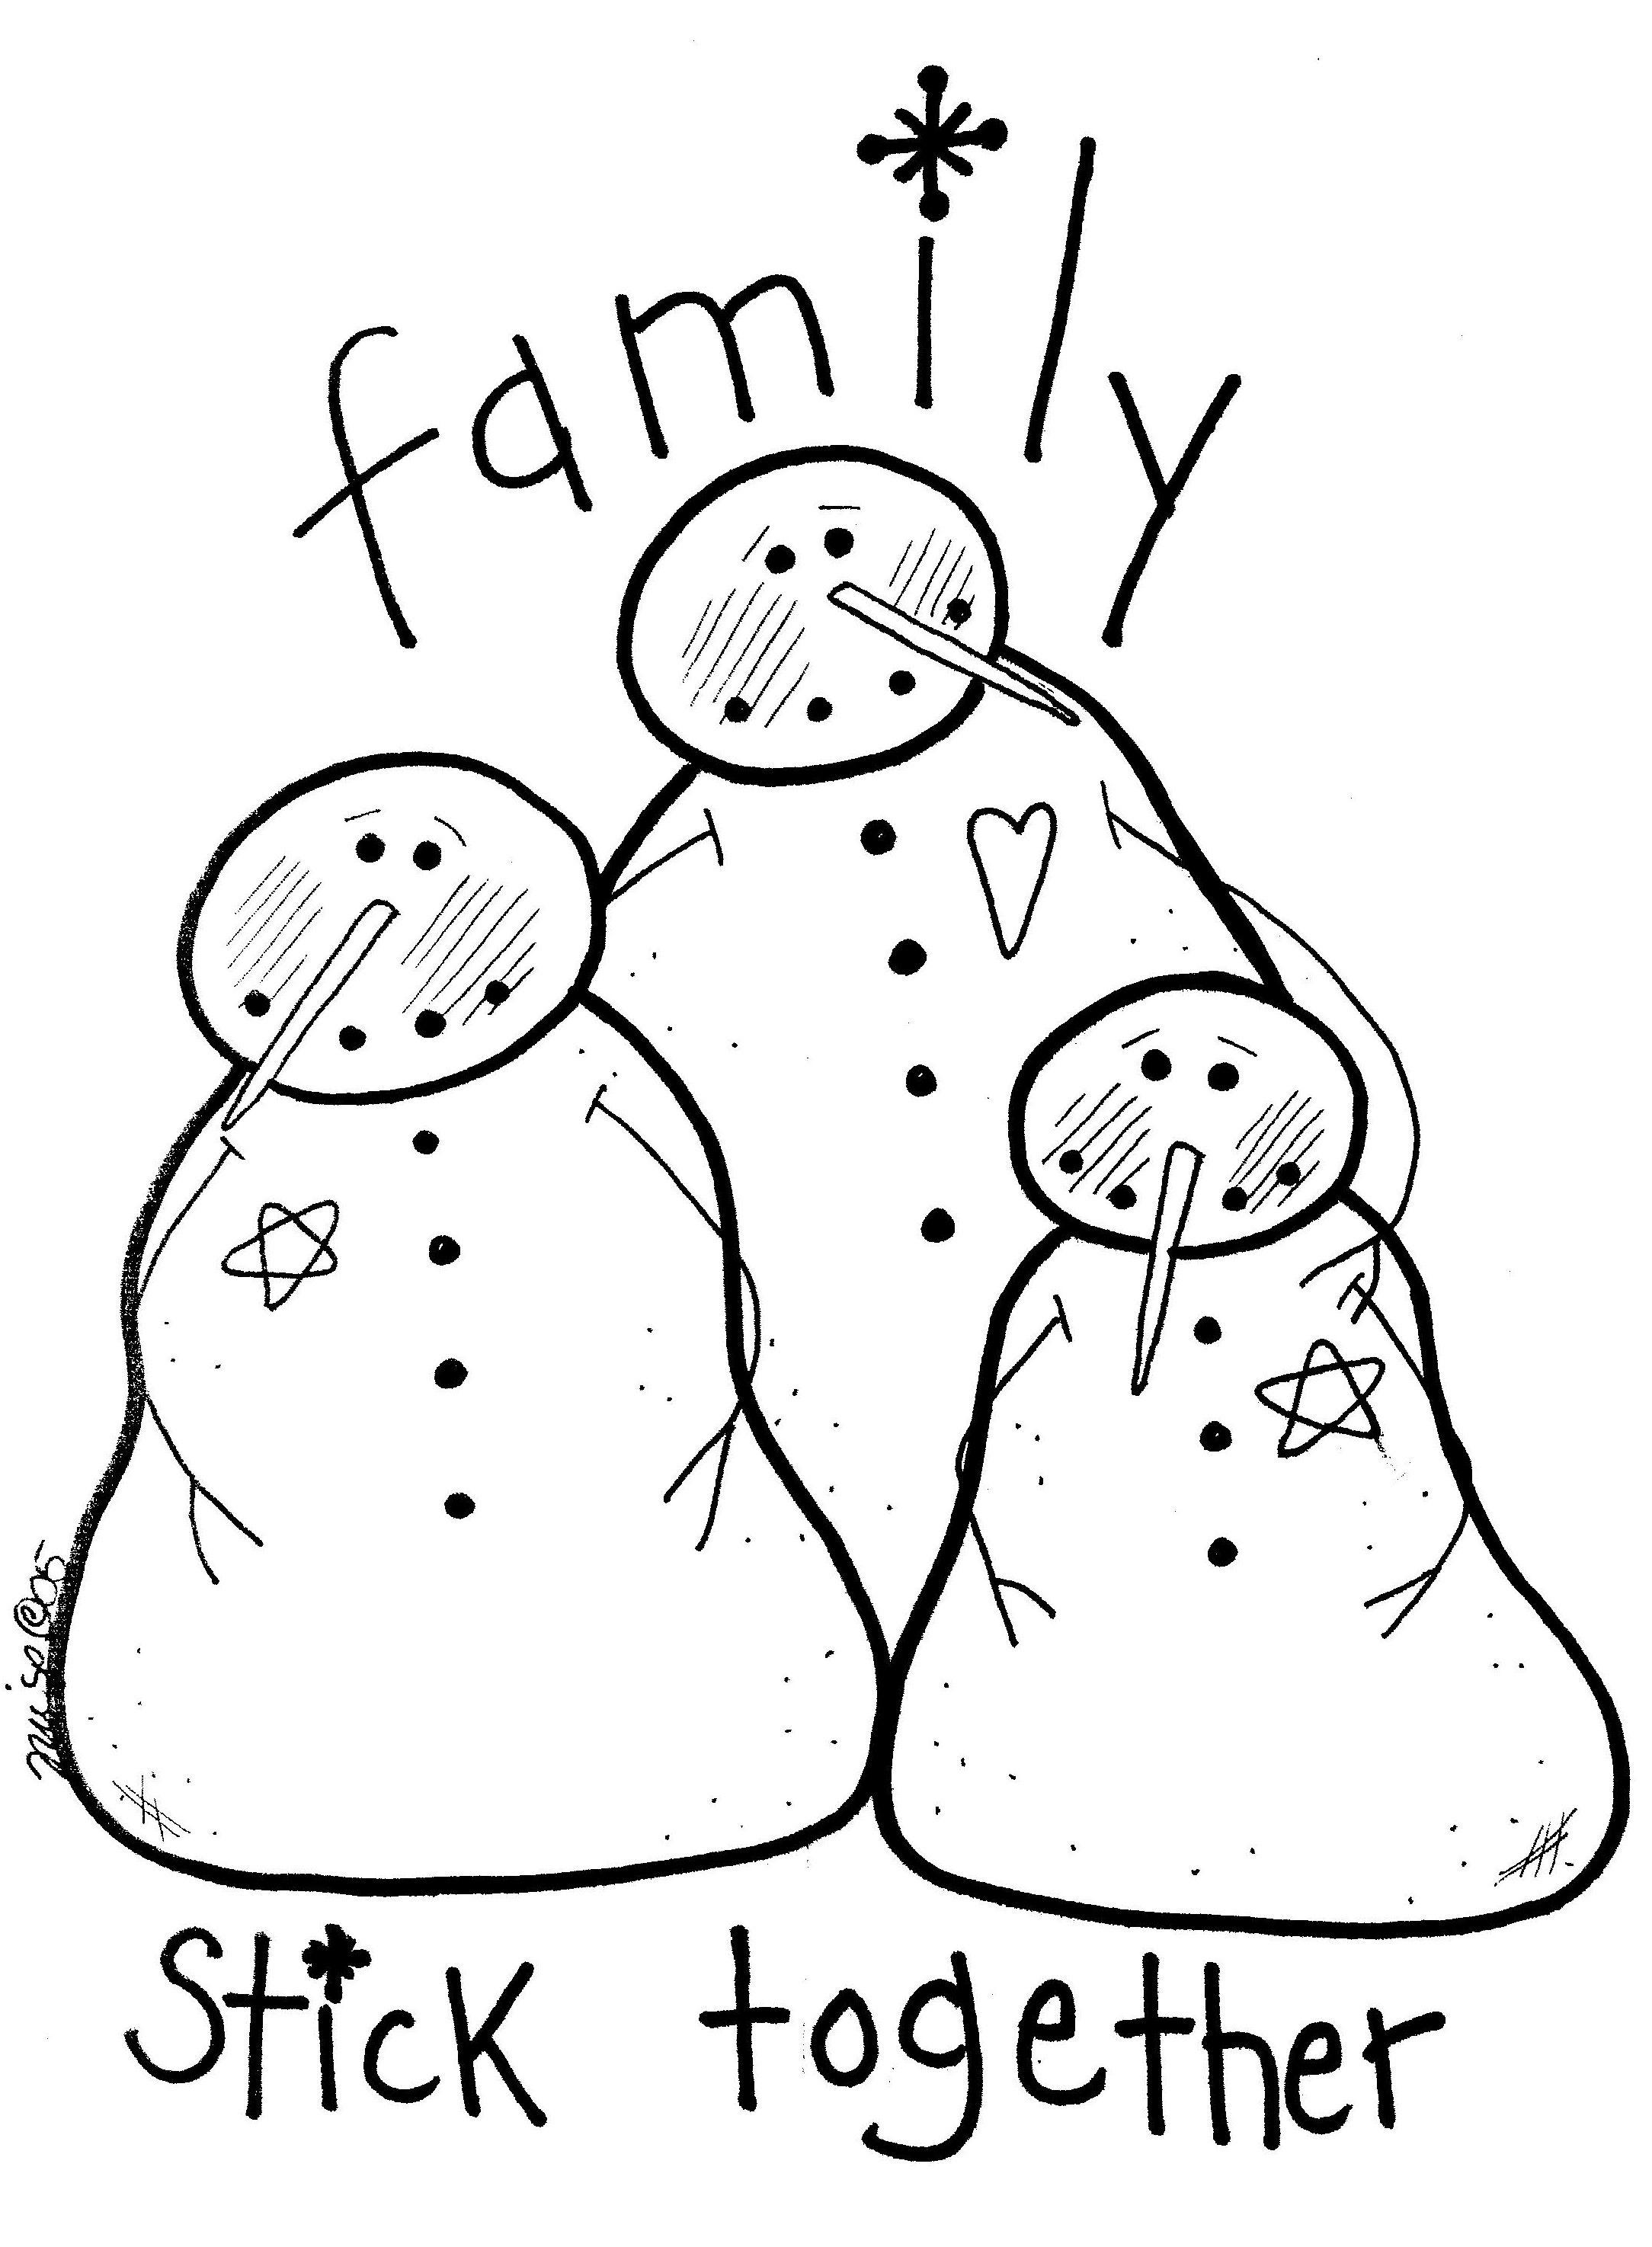 Pin by samantha warrick on design time pinterest snowman free winter snowmen pattern for red work quilt bankloansurffo Gallery